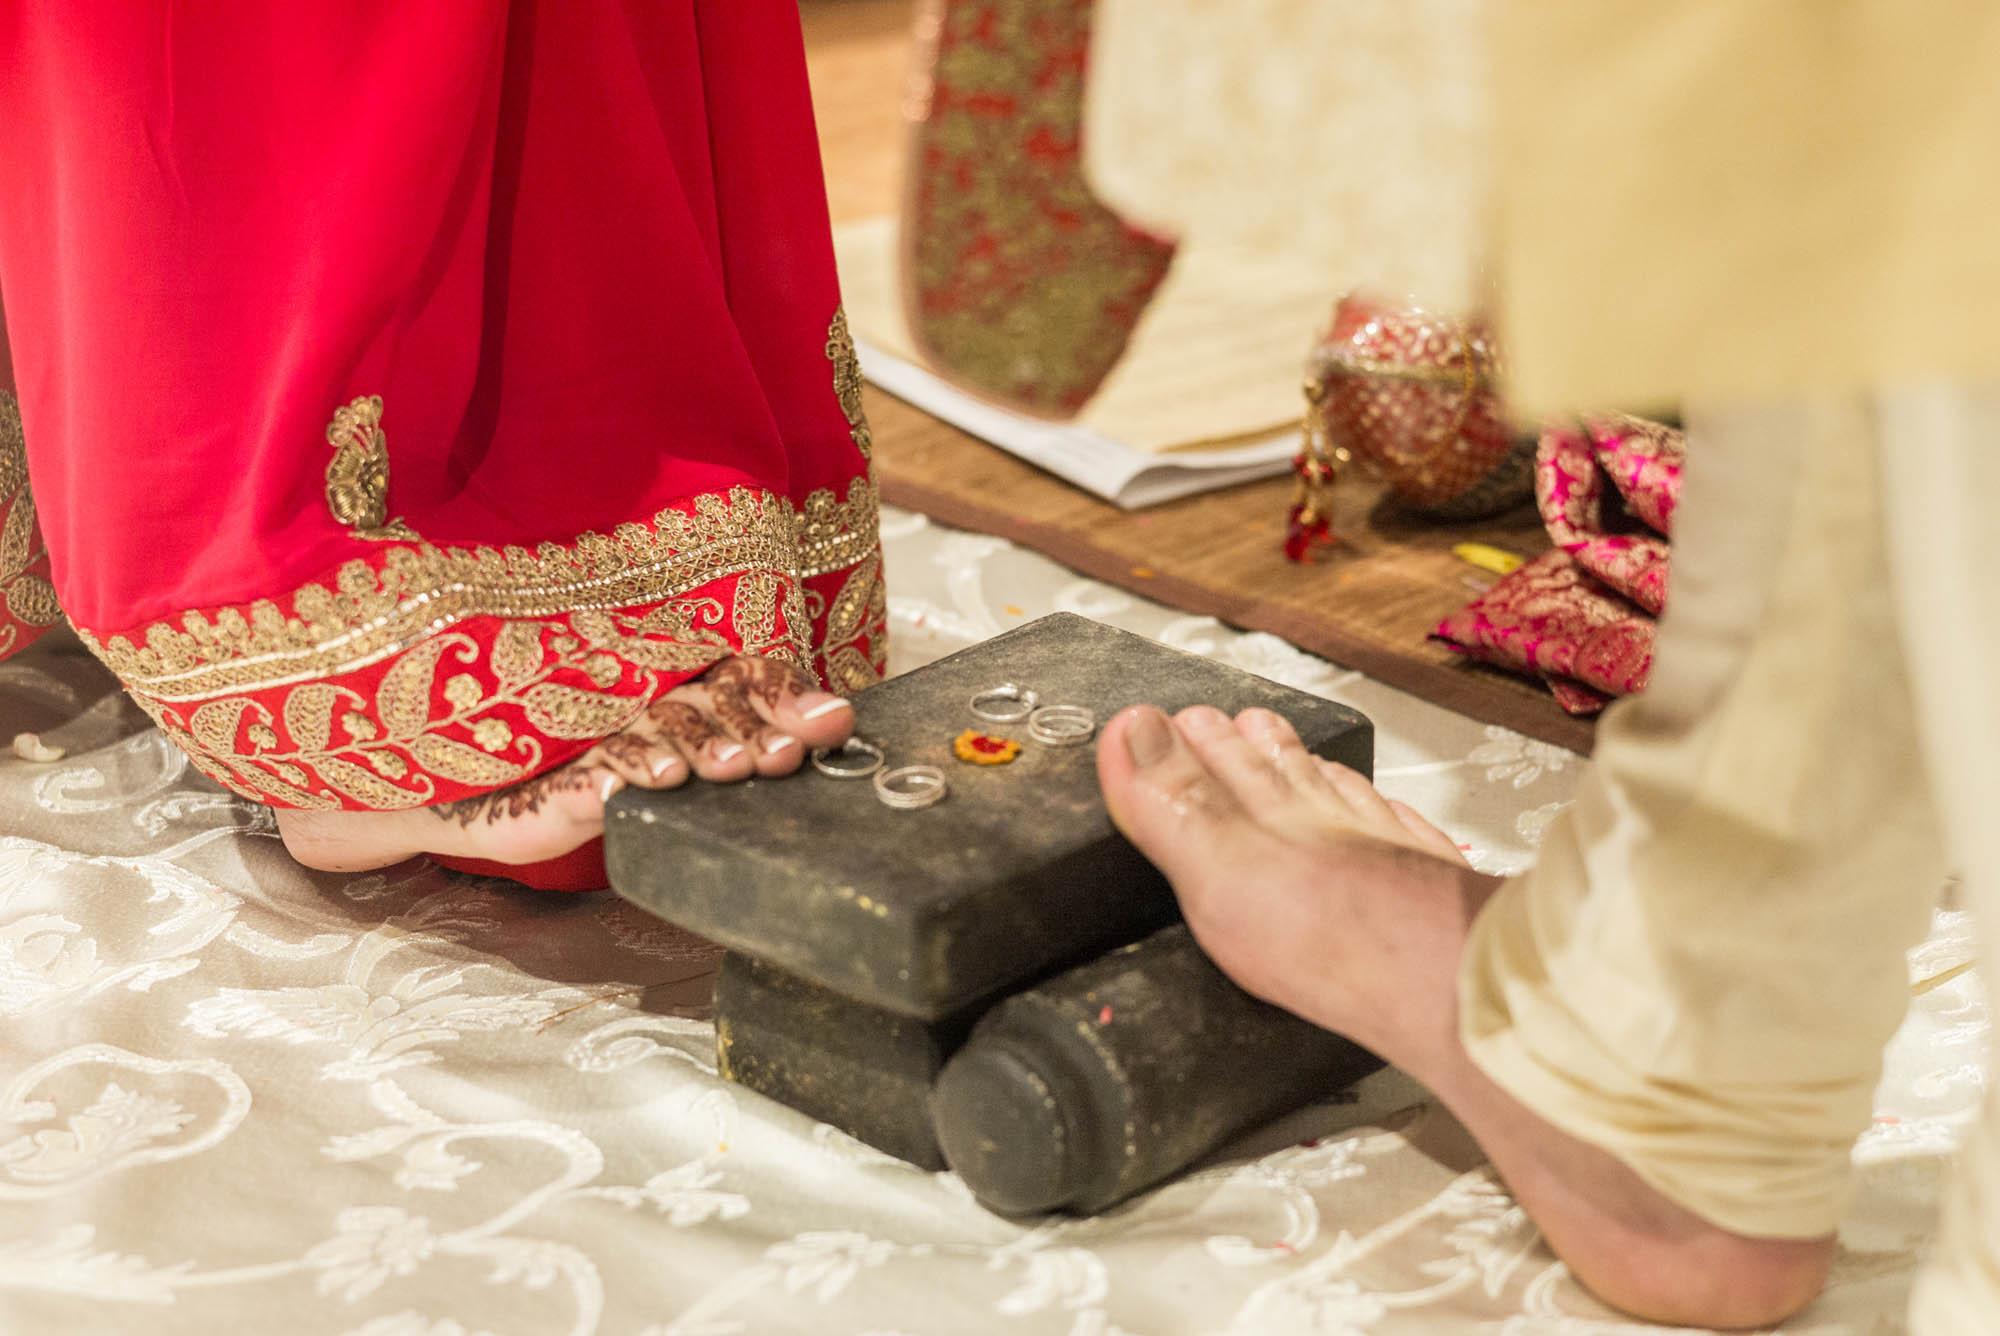 MacDougall-Photography-Sydney-Wedding-Photographers-15.jpg